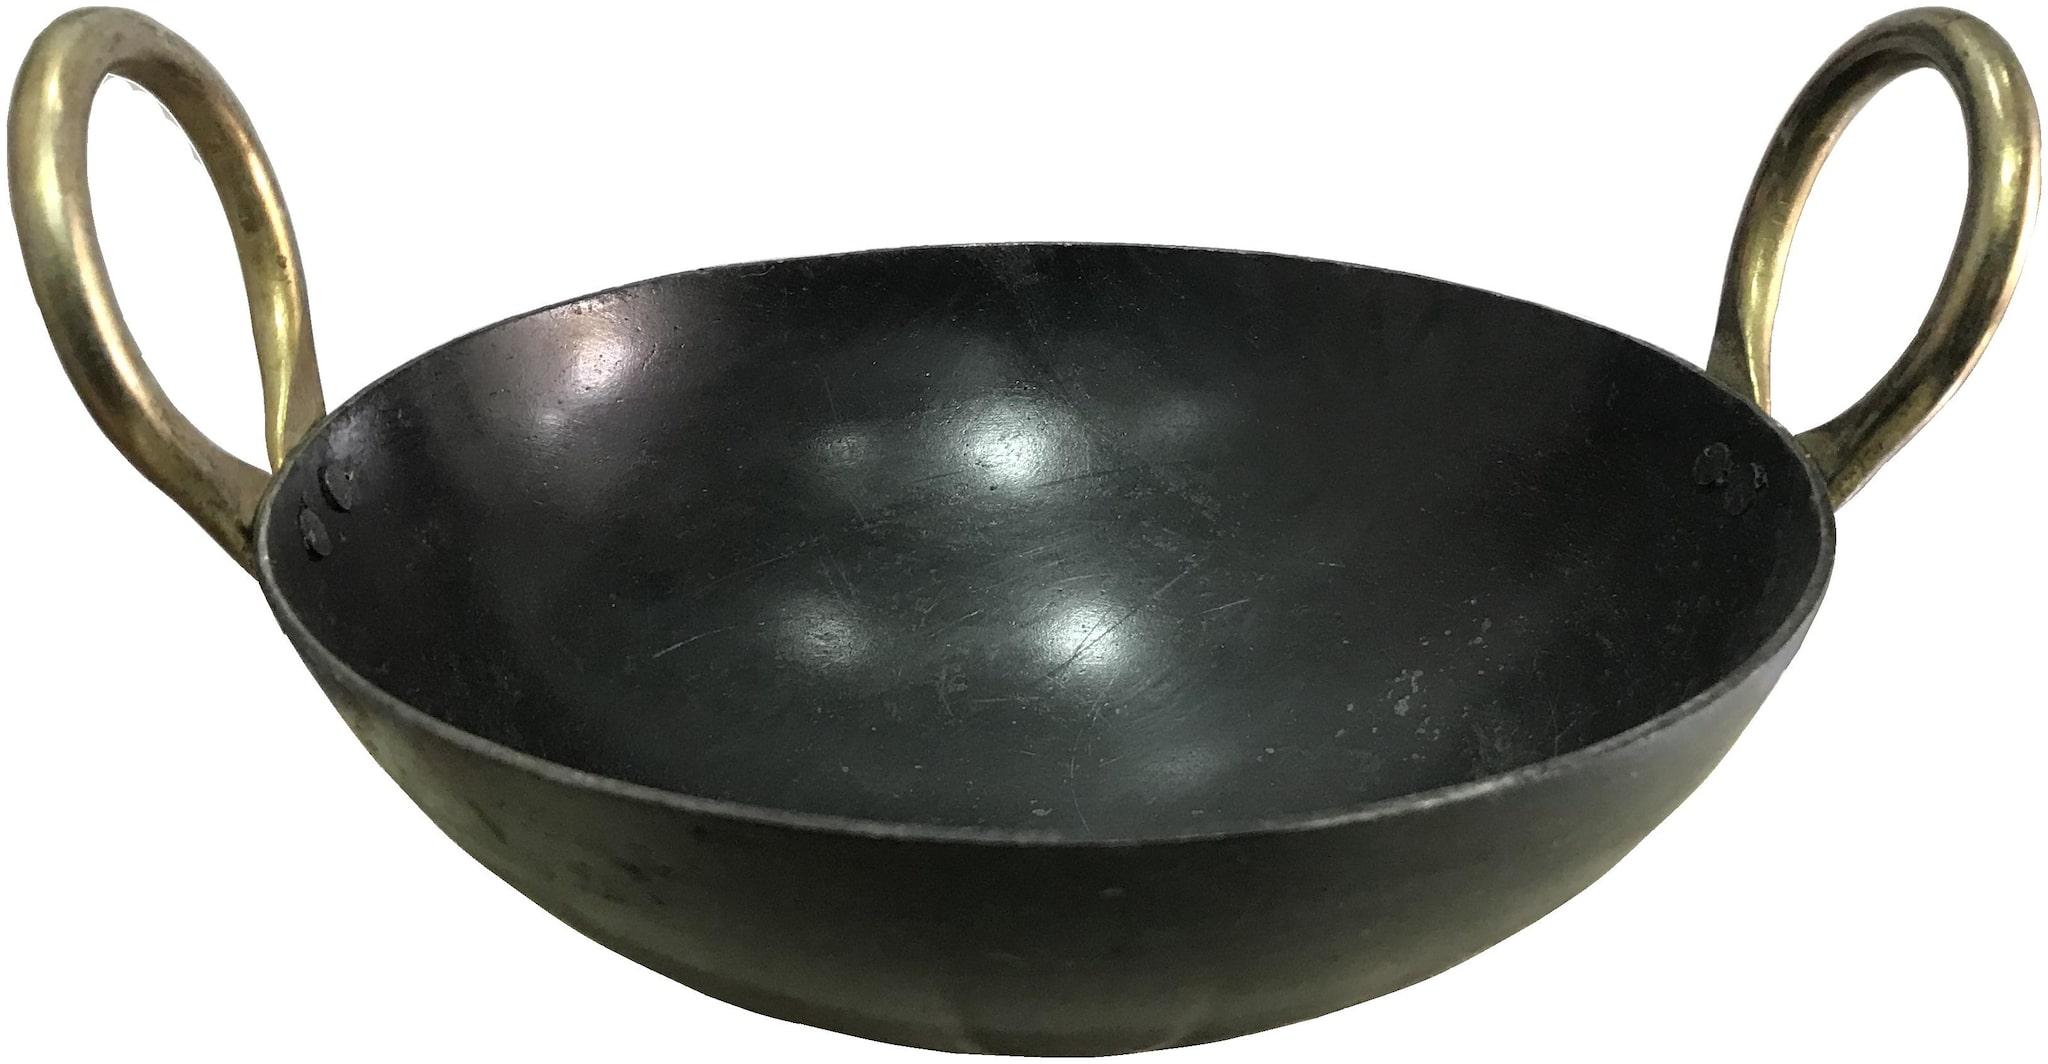 13 inch Indian Household Iron Kadhai With Handle  33.02 cm